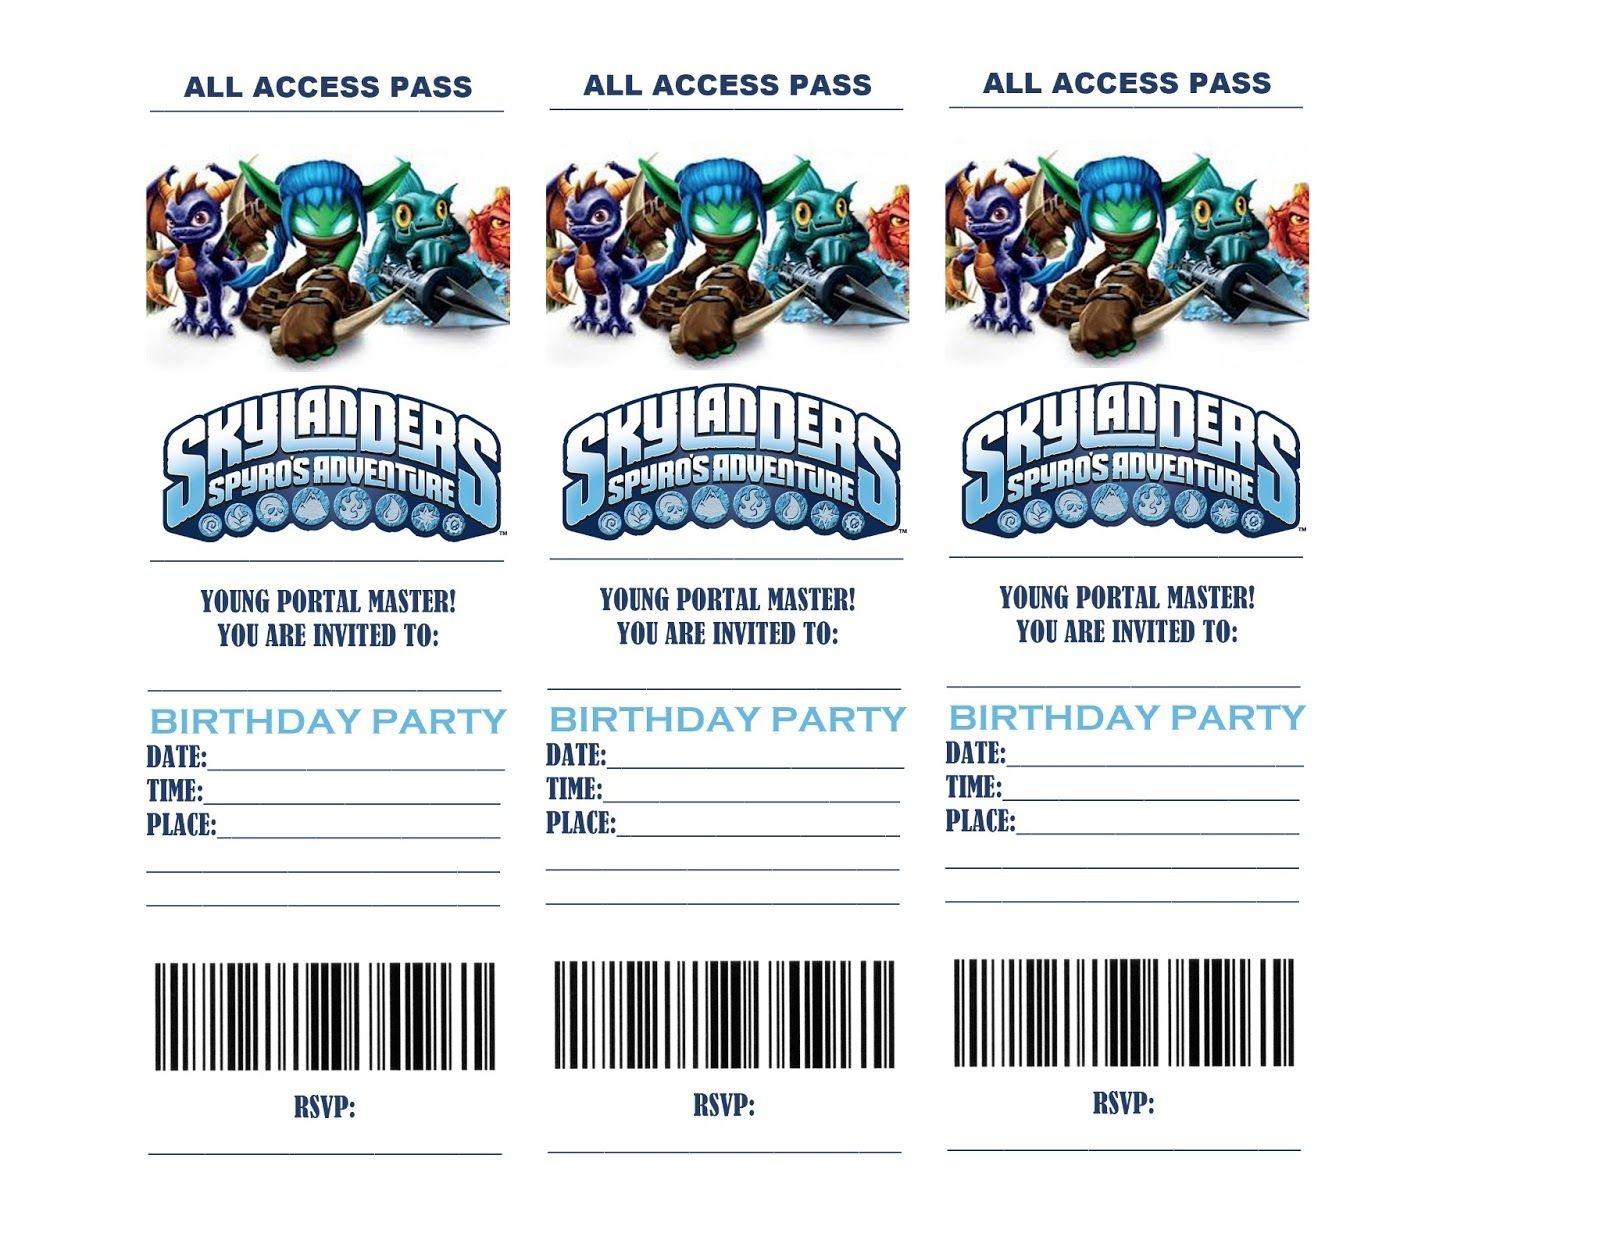 Skylanders Birthday Party Invitations | Life In A Larger Story - Free Printable Skylander Invitations